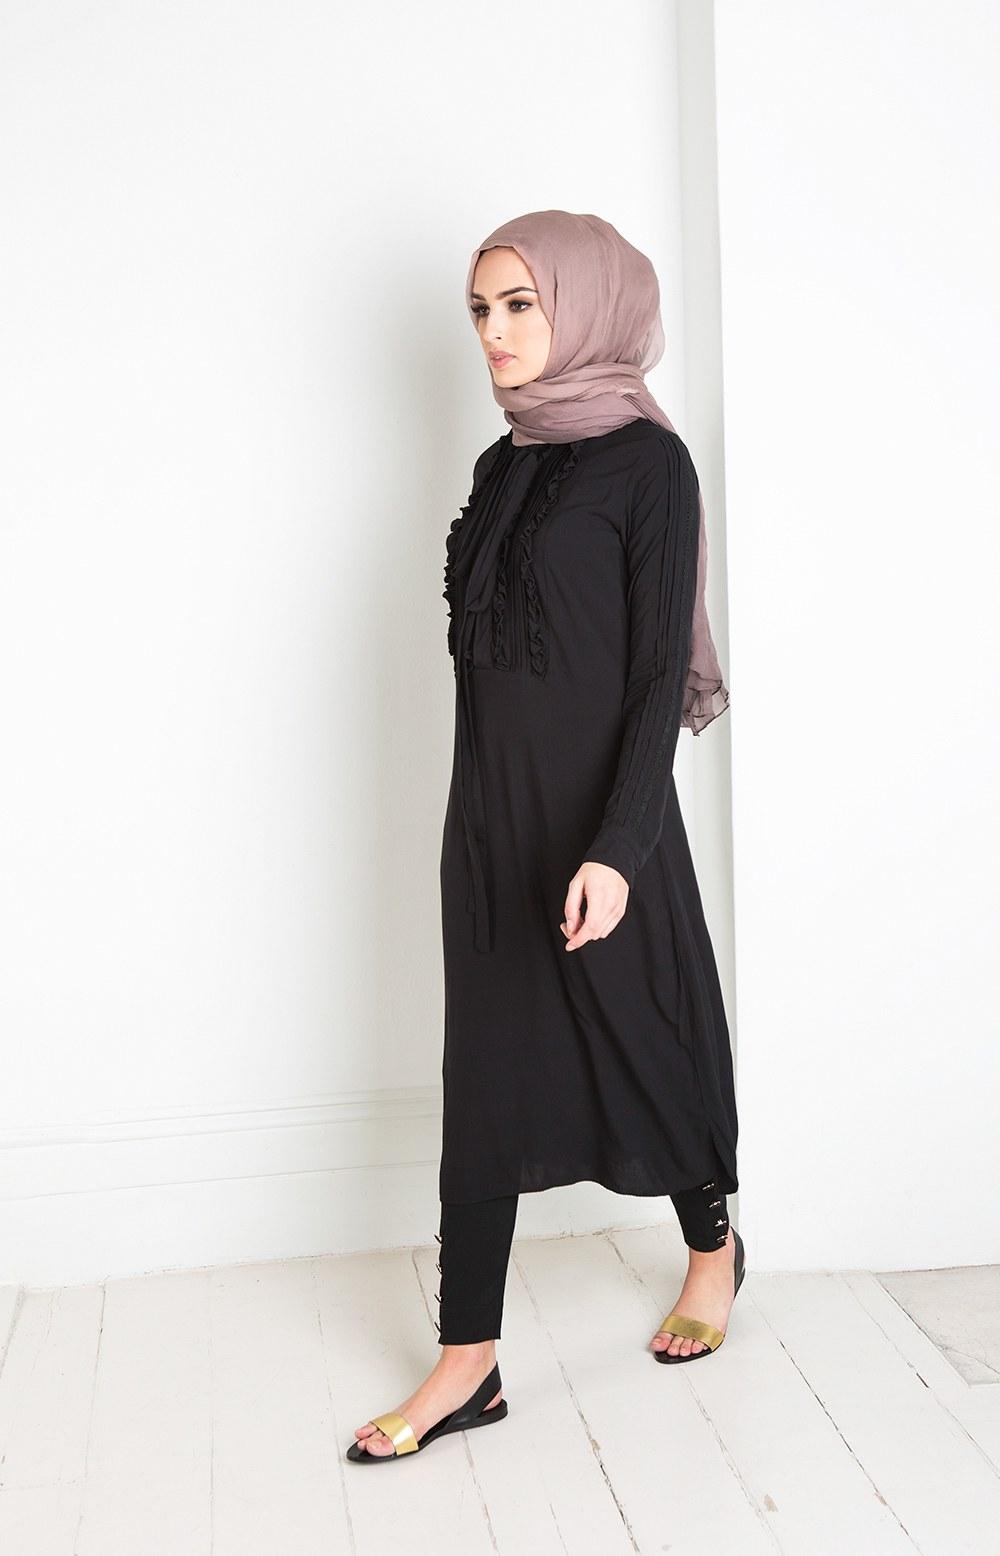 Bentuk Model Baju Lebaran Modern Q0d4 25 Trend Model Baju Muslim Lebaran 2018 Simple & Modis